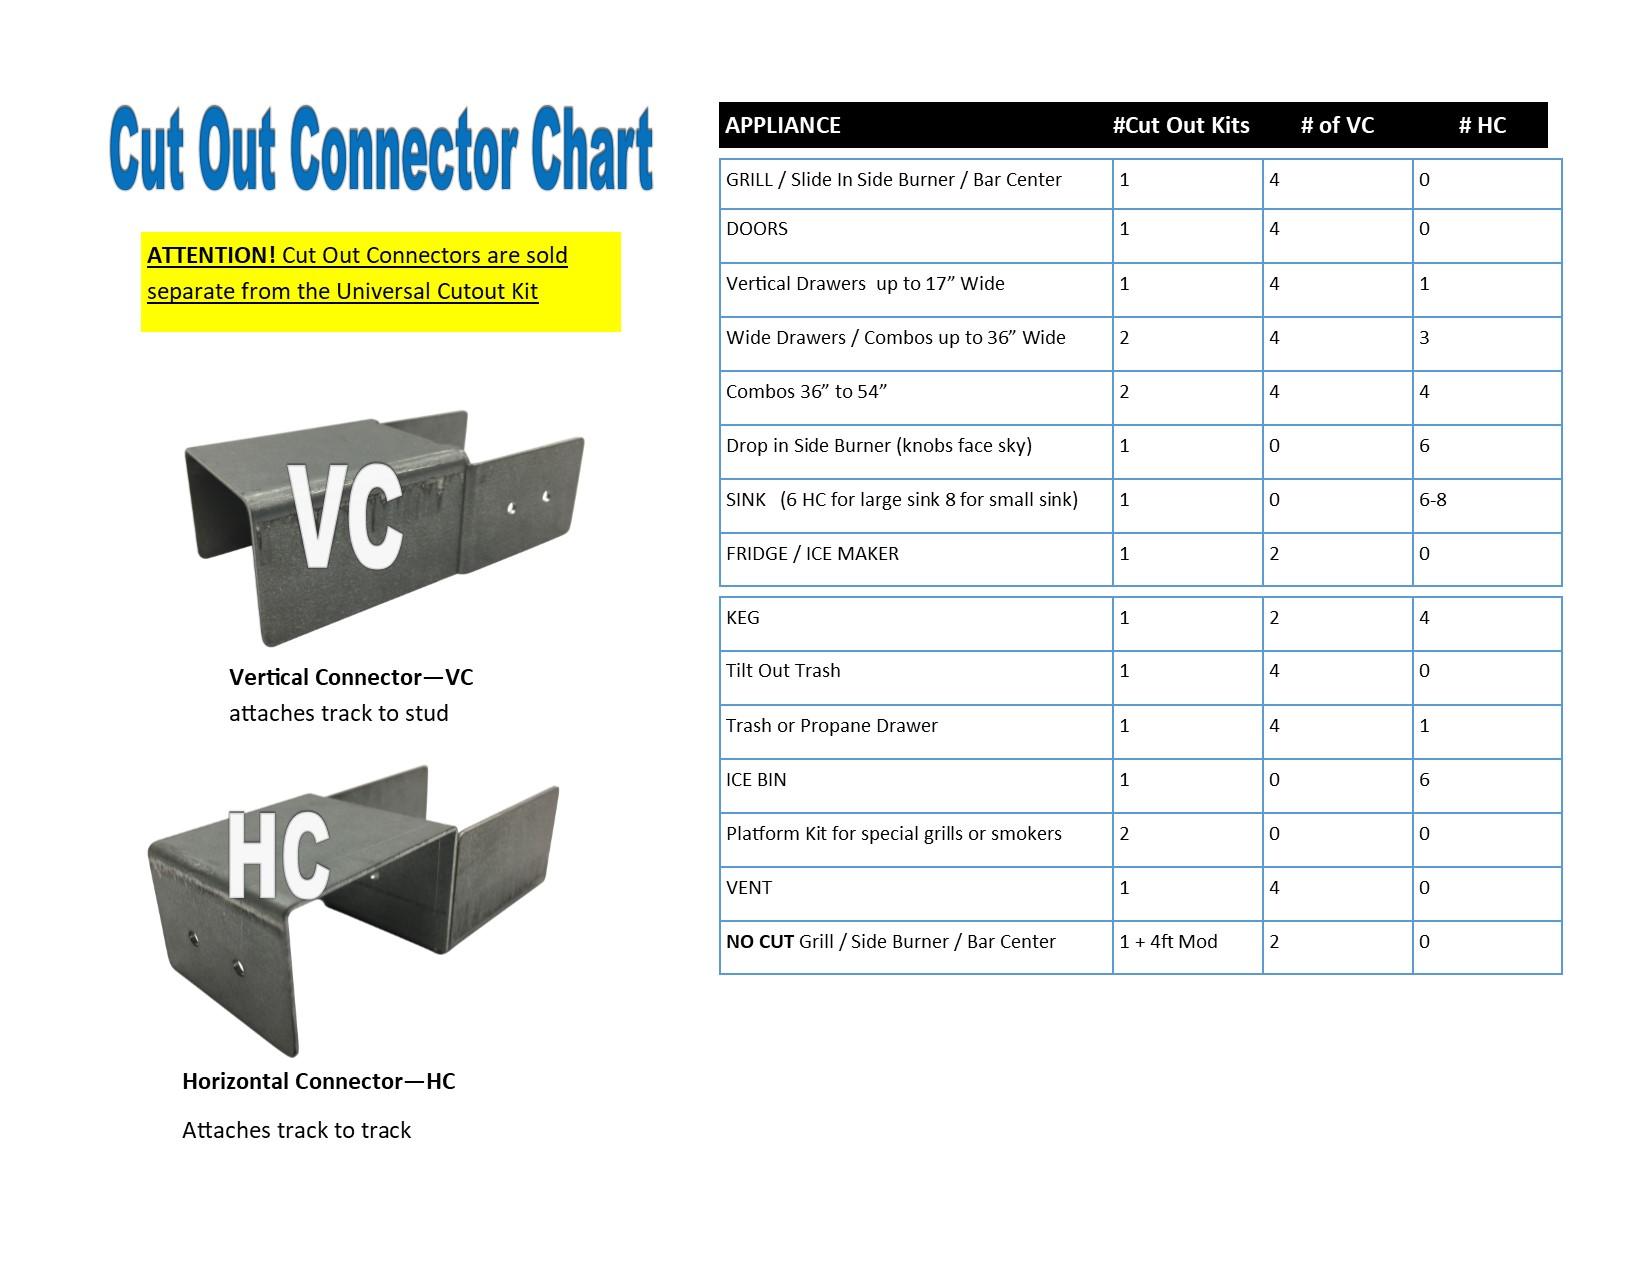 connector-chart-cutouts.jpg